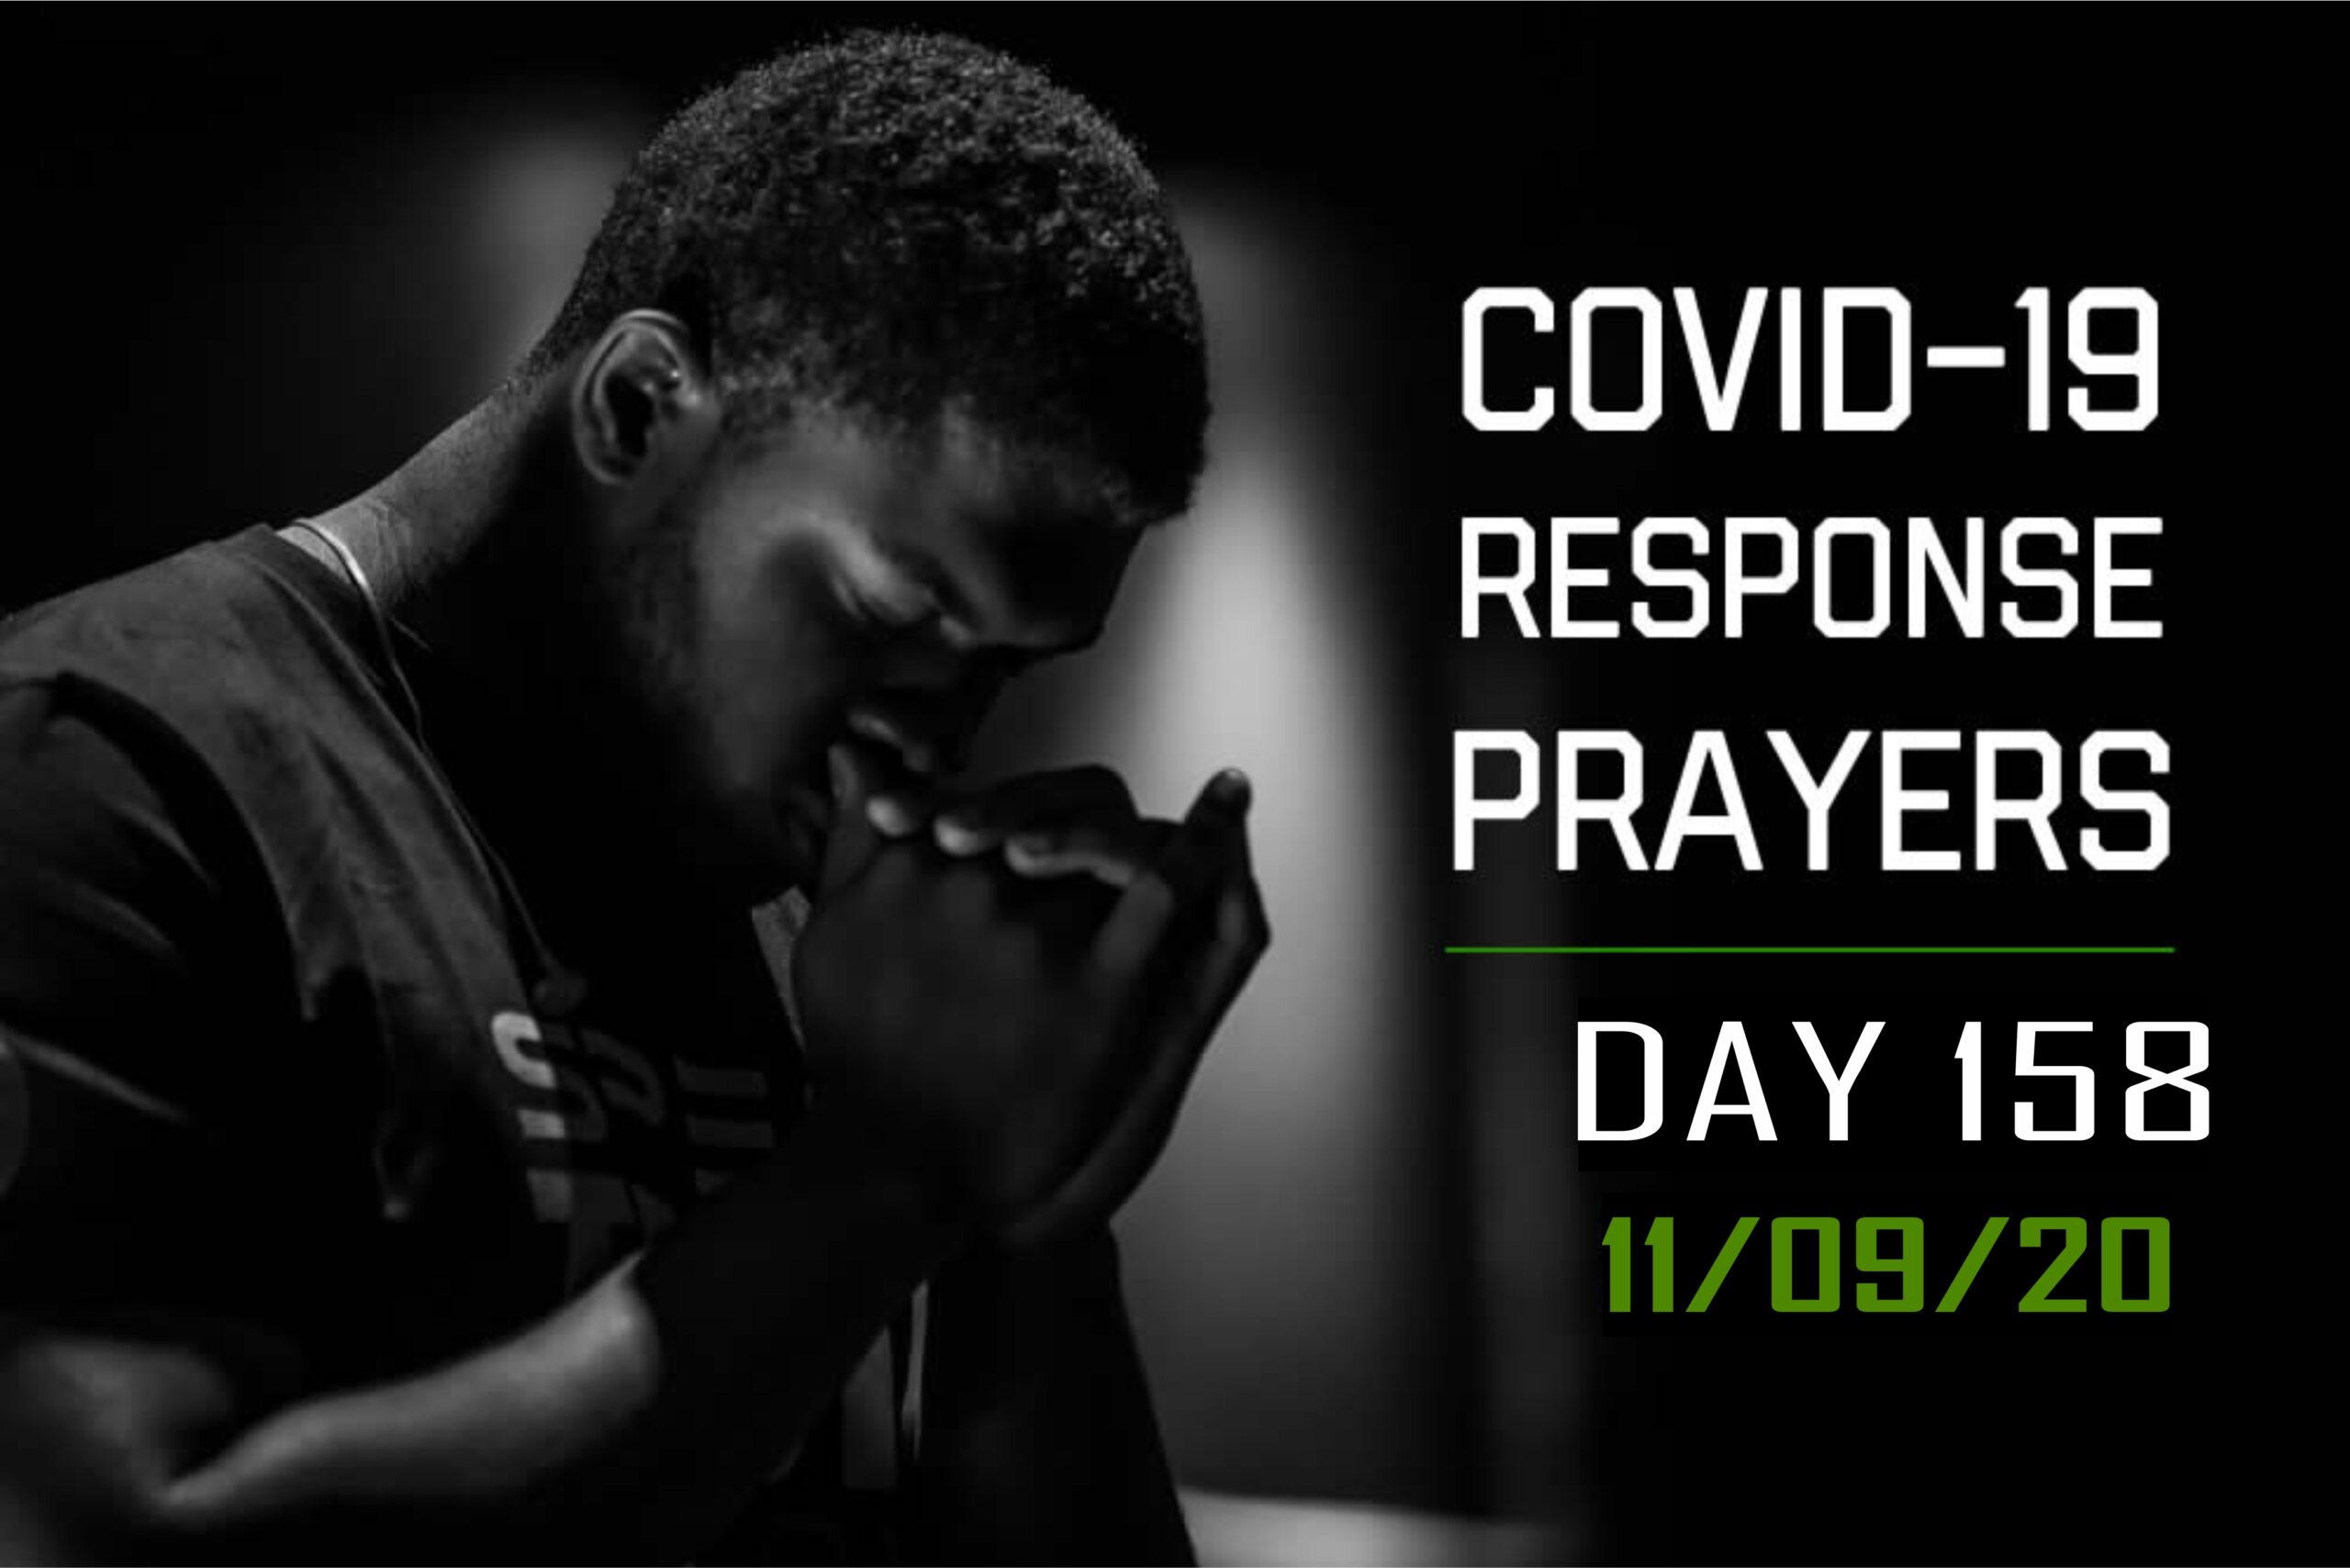 COVID-19 Response Prayers Day – 158